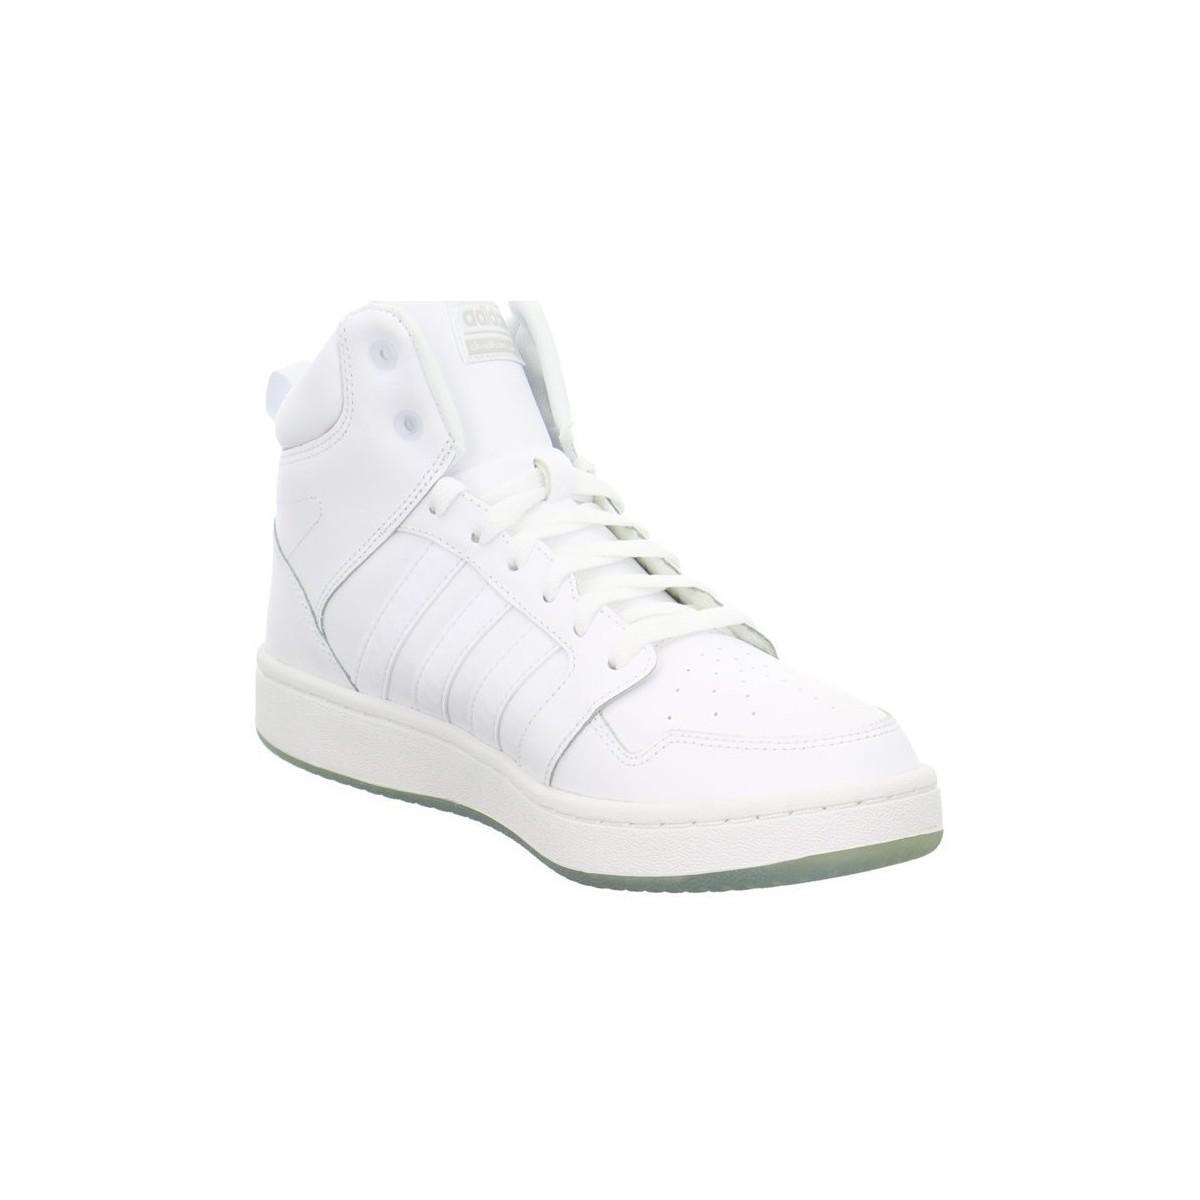 52493273784 adidas Cloudfoam Super Hoops Mid Sneaker Men s Shoes (high-top ...